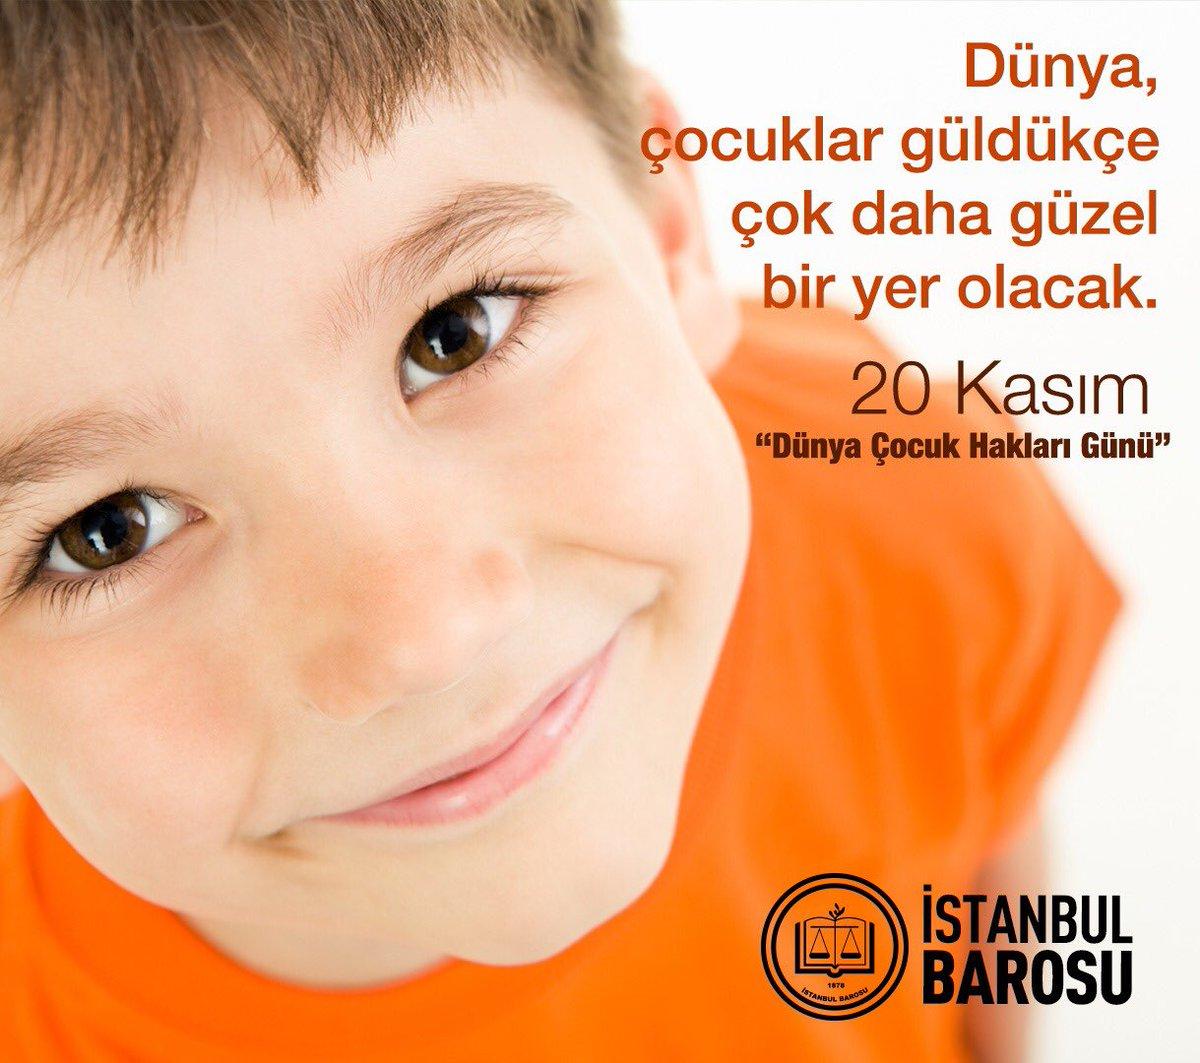 İstanbul Barosu в Twitter: